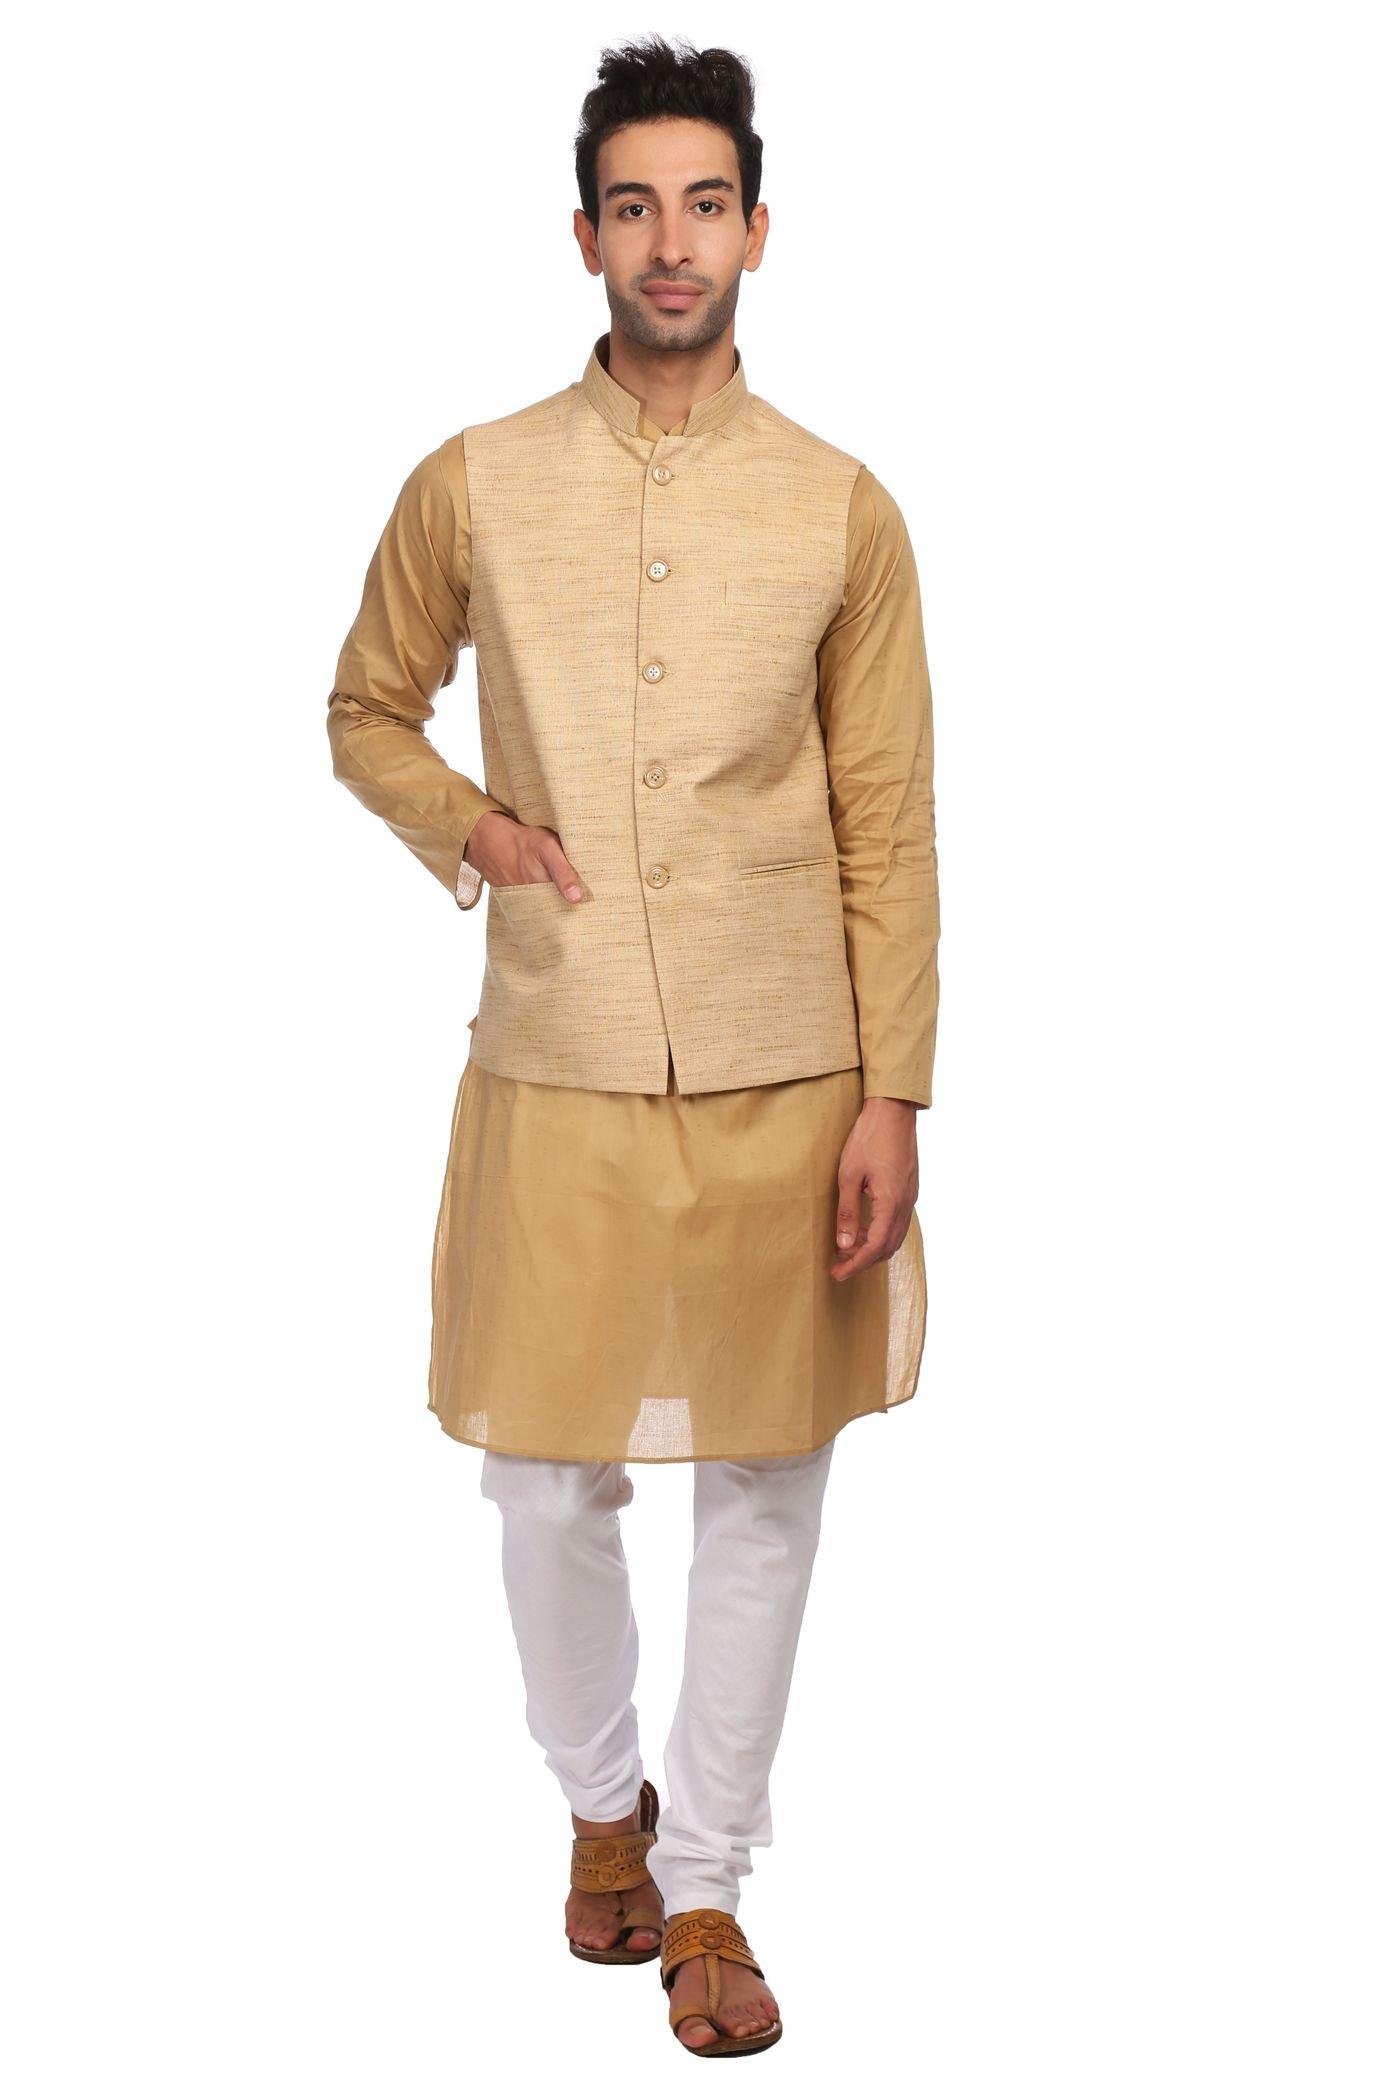 WINTAGE Men's KhadiBeige Nehru Jacket Waistcoat and 100% Cotton Pista Kurta Pajama Indian Ethnic Set : XXXX-Large